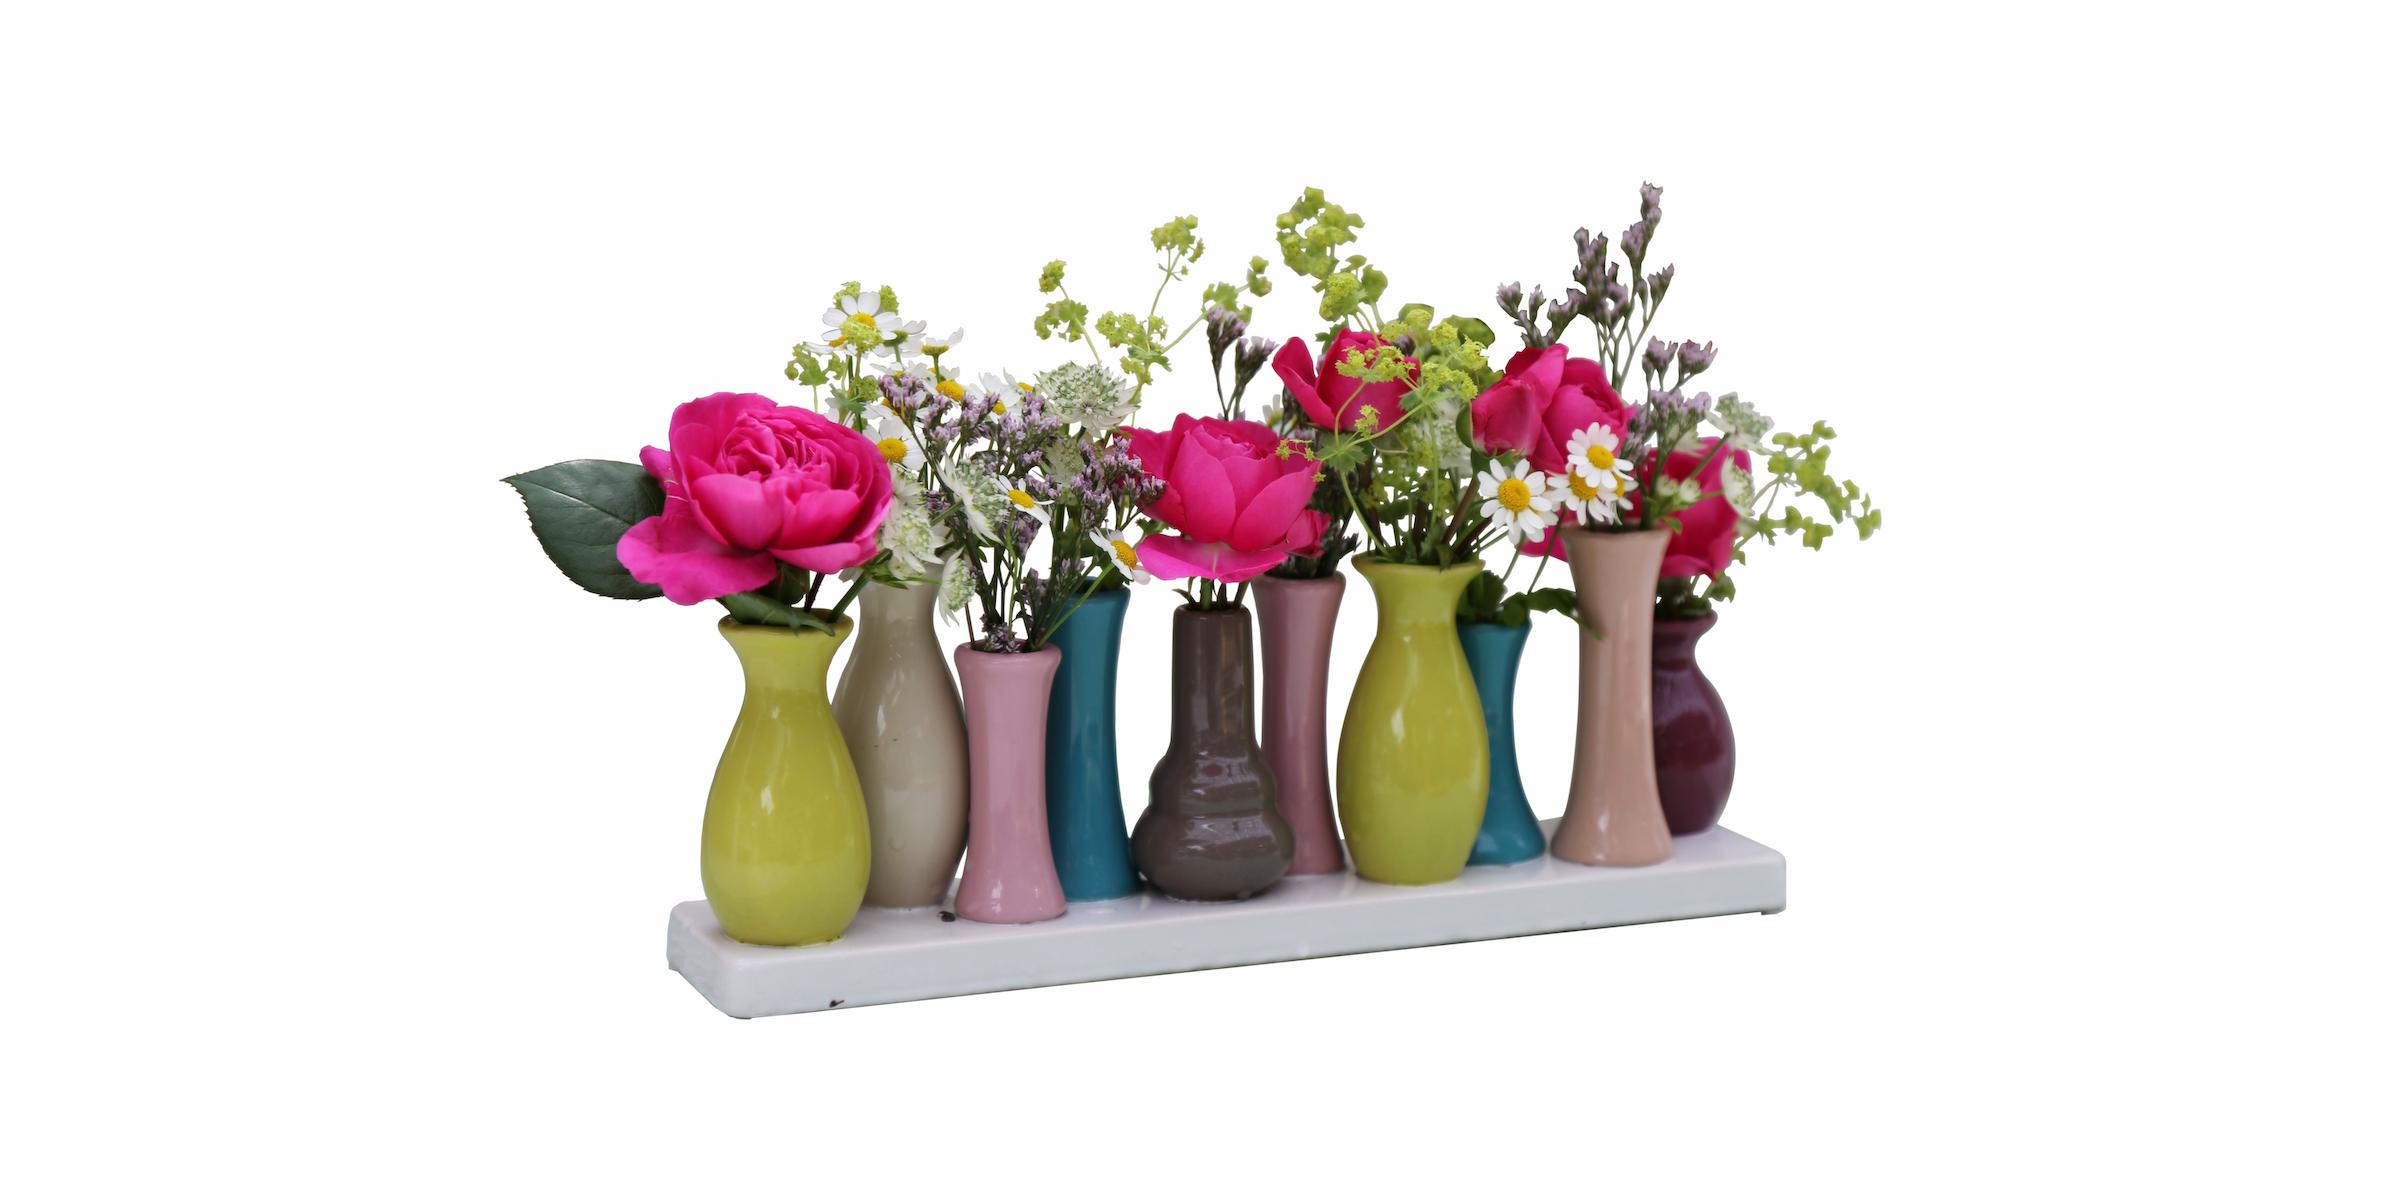 Keramikvasenset Blumenvase Keramikvasen bunt